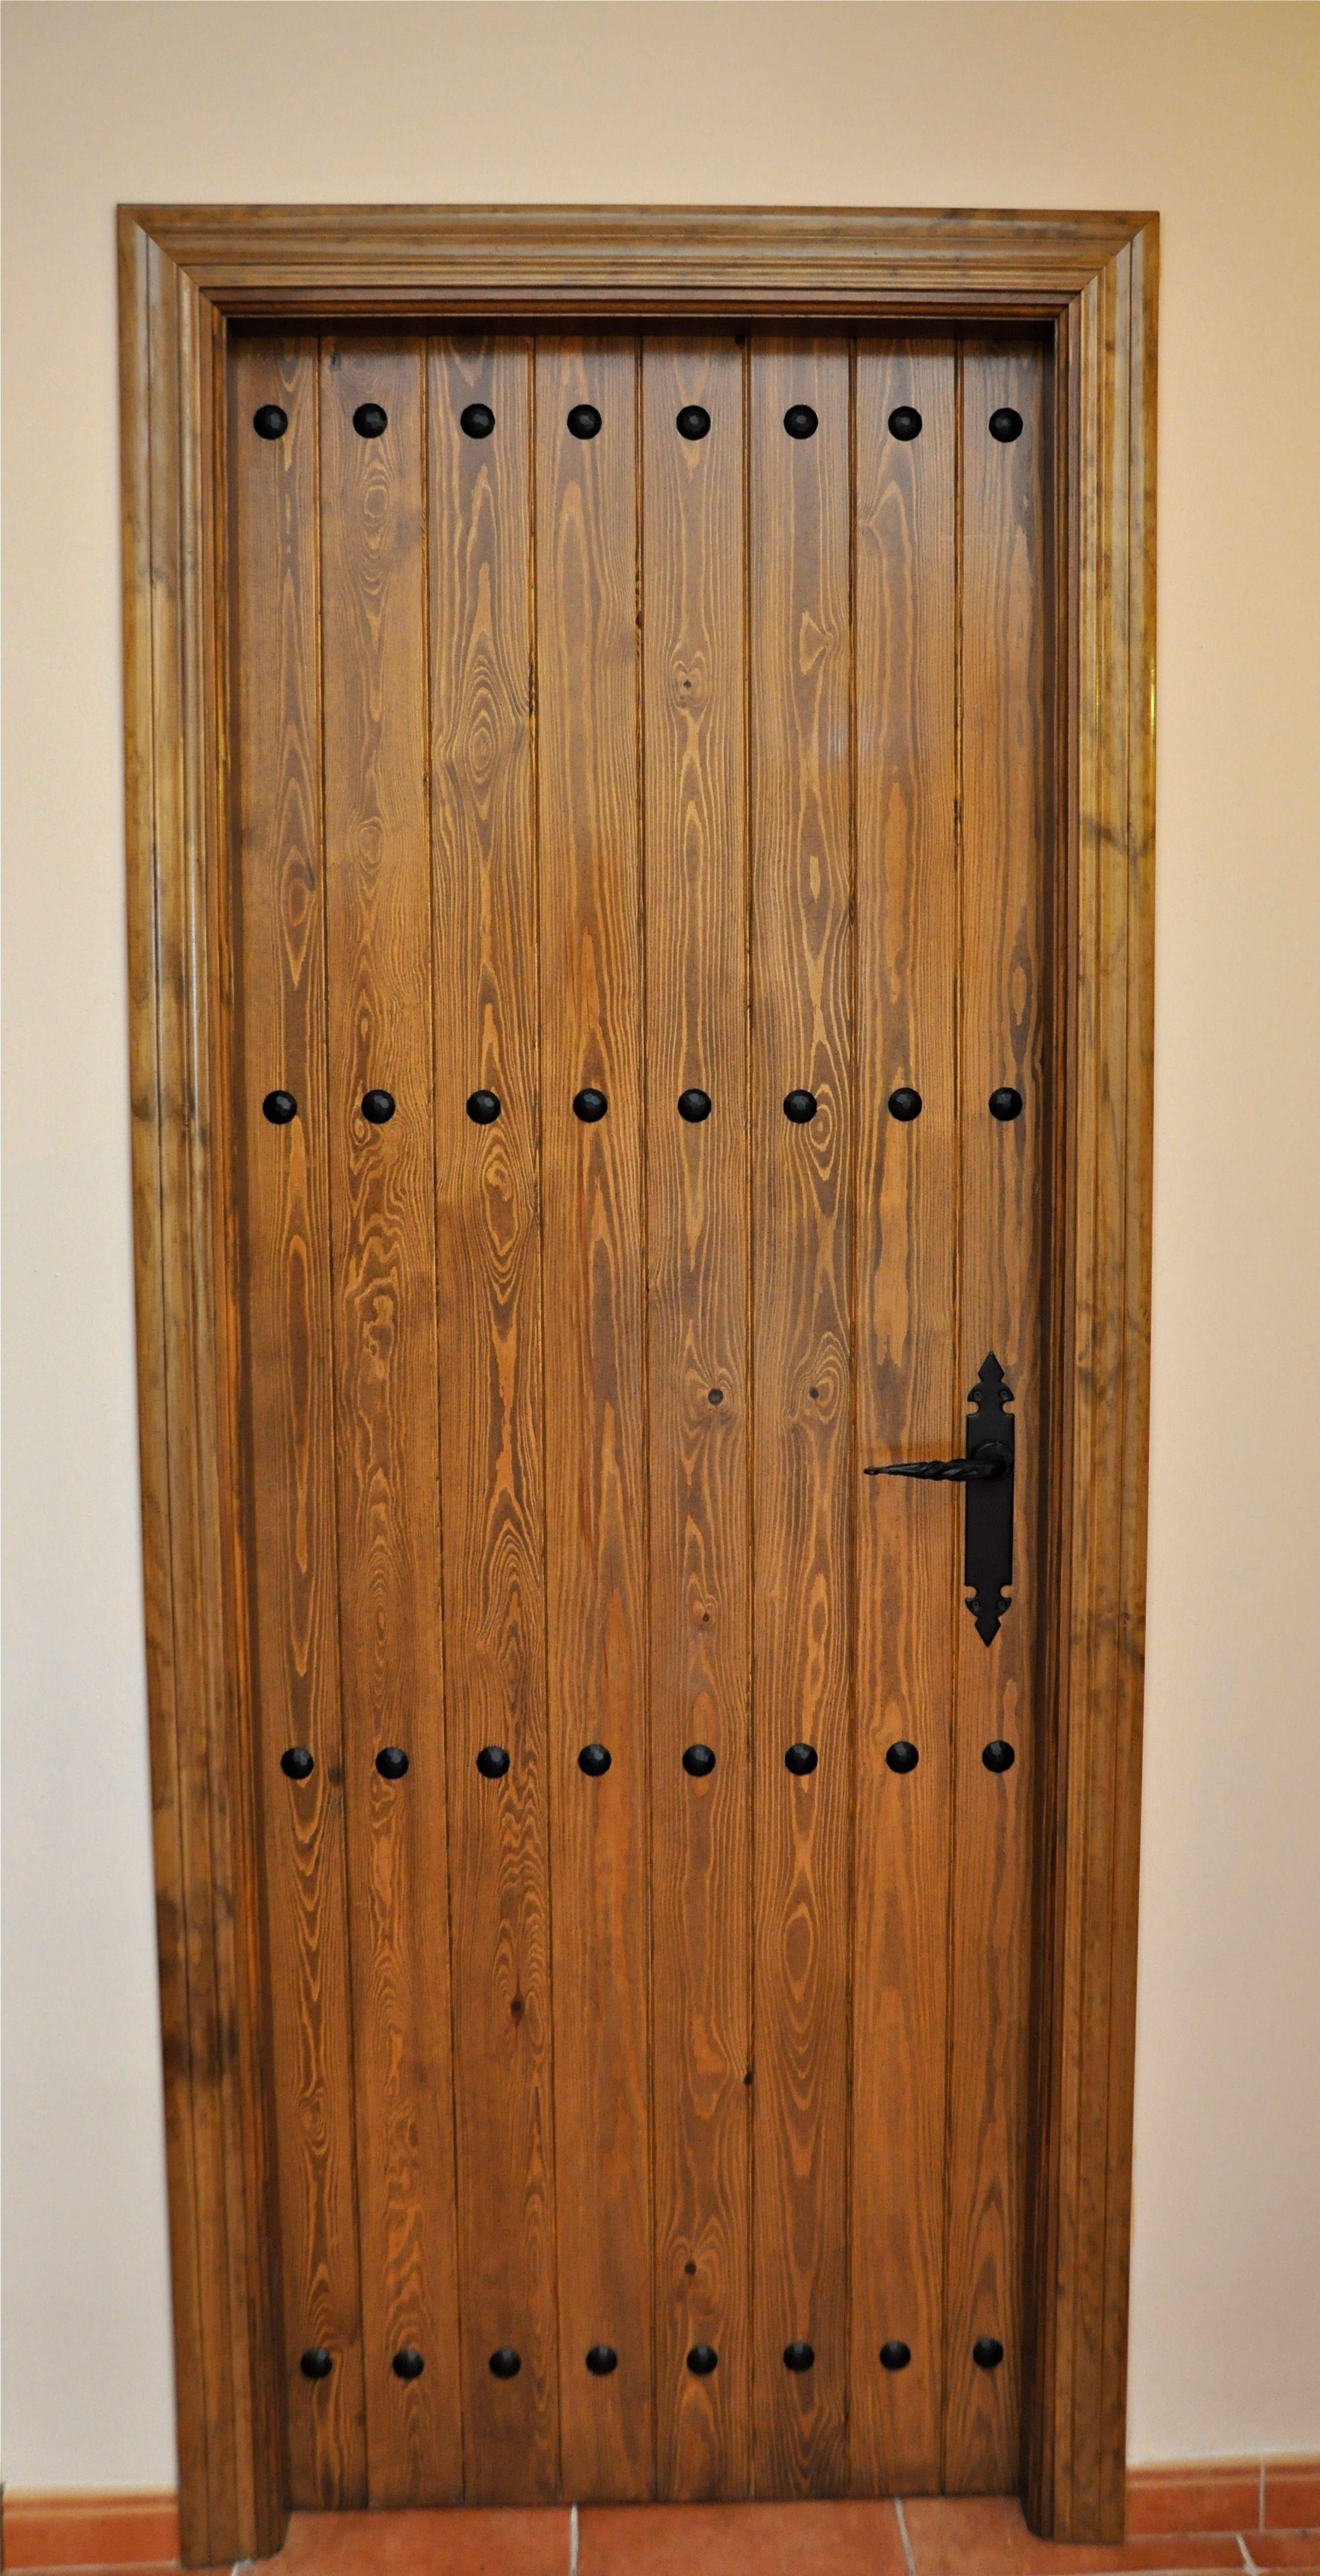 Pin de blanca aragon en puertas pinterest gitano for Puertas para casa interior